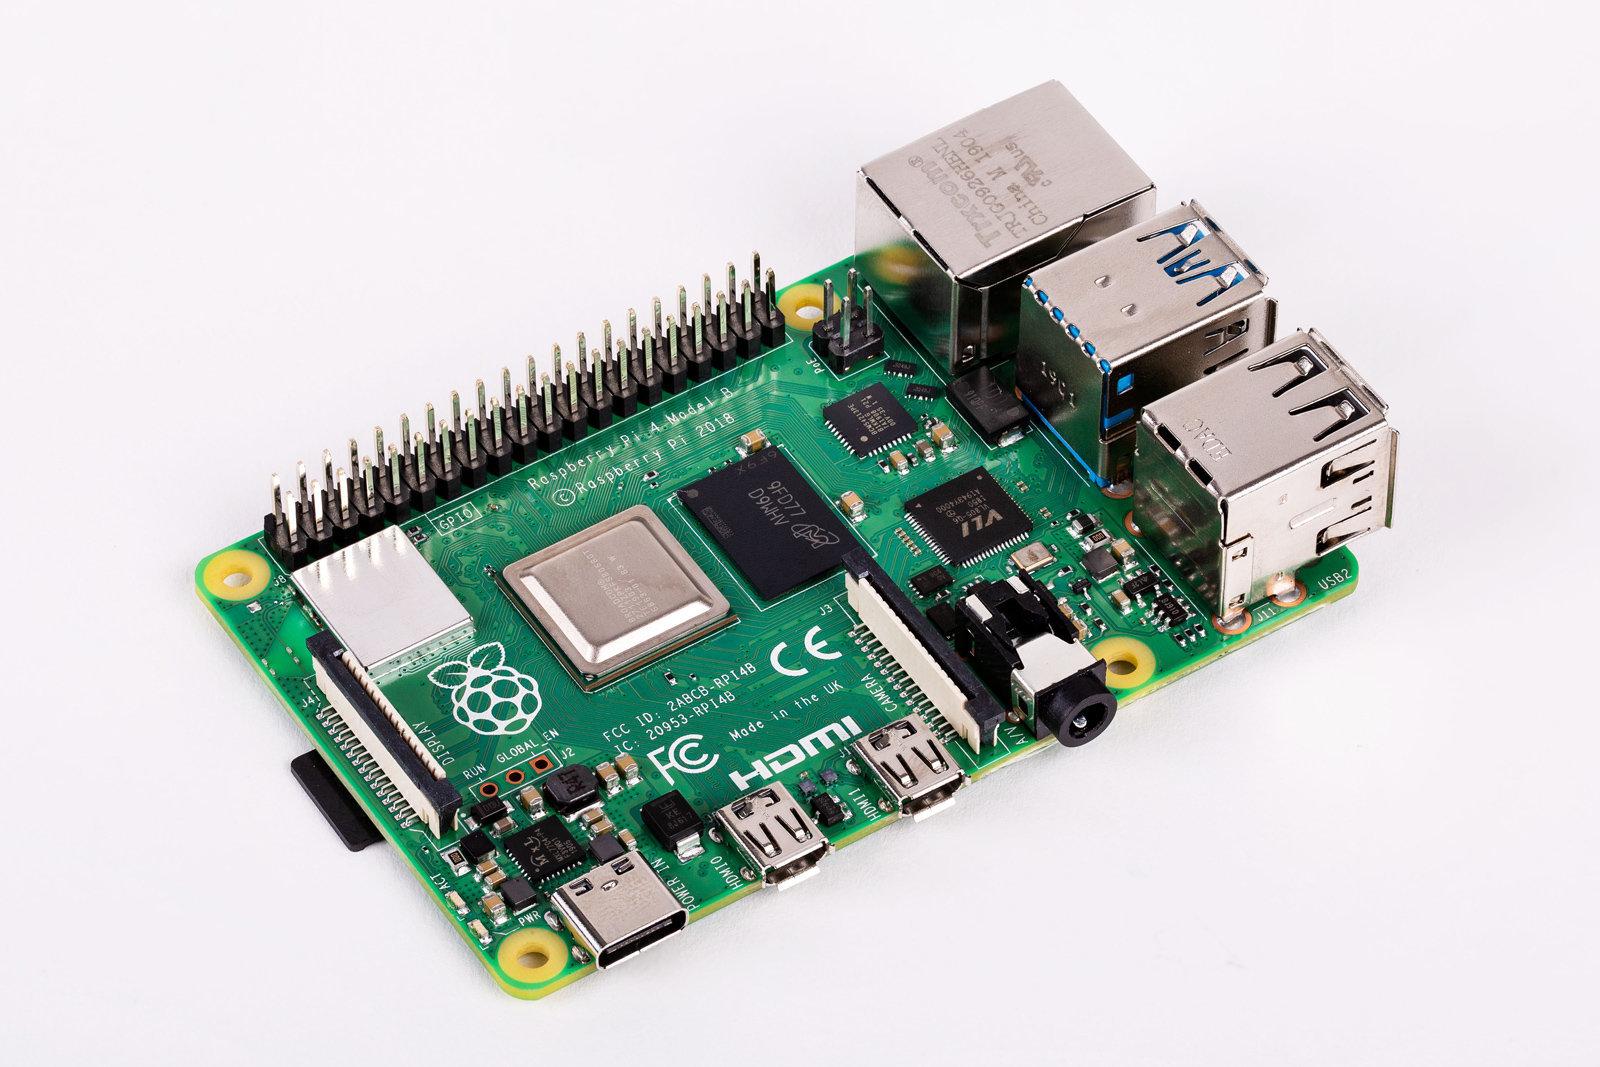 Мини-компьютер Raspberry Pi4 представлен официально